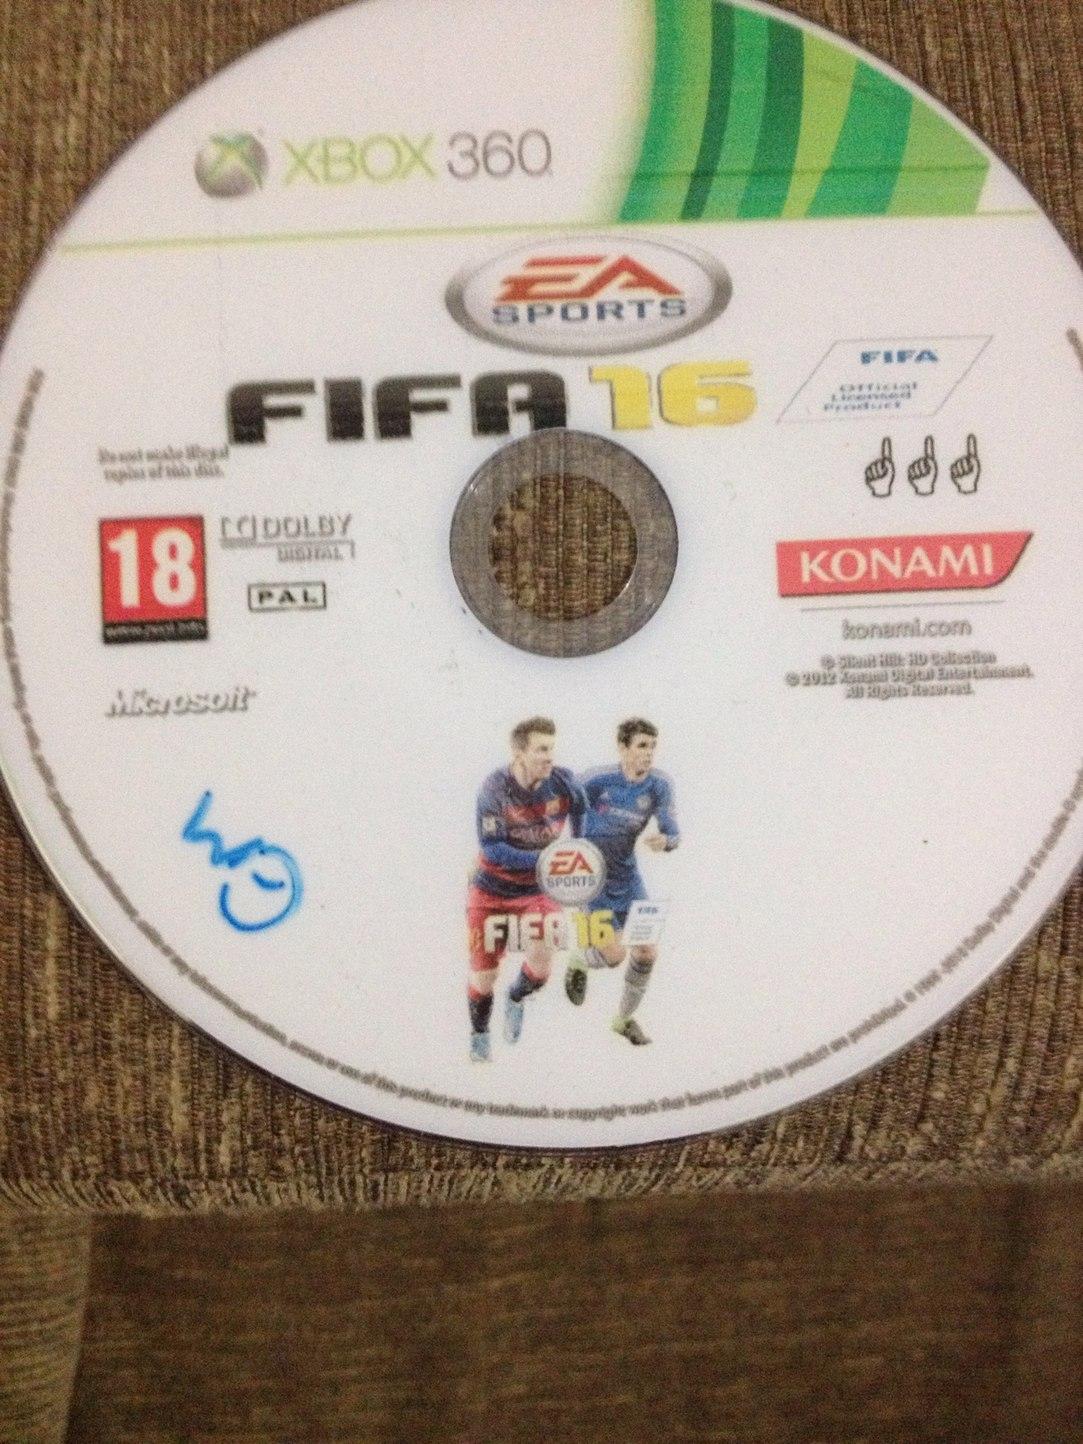 FIFA 16 DA KONAMI PRA +18 - meme